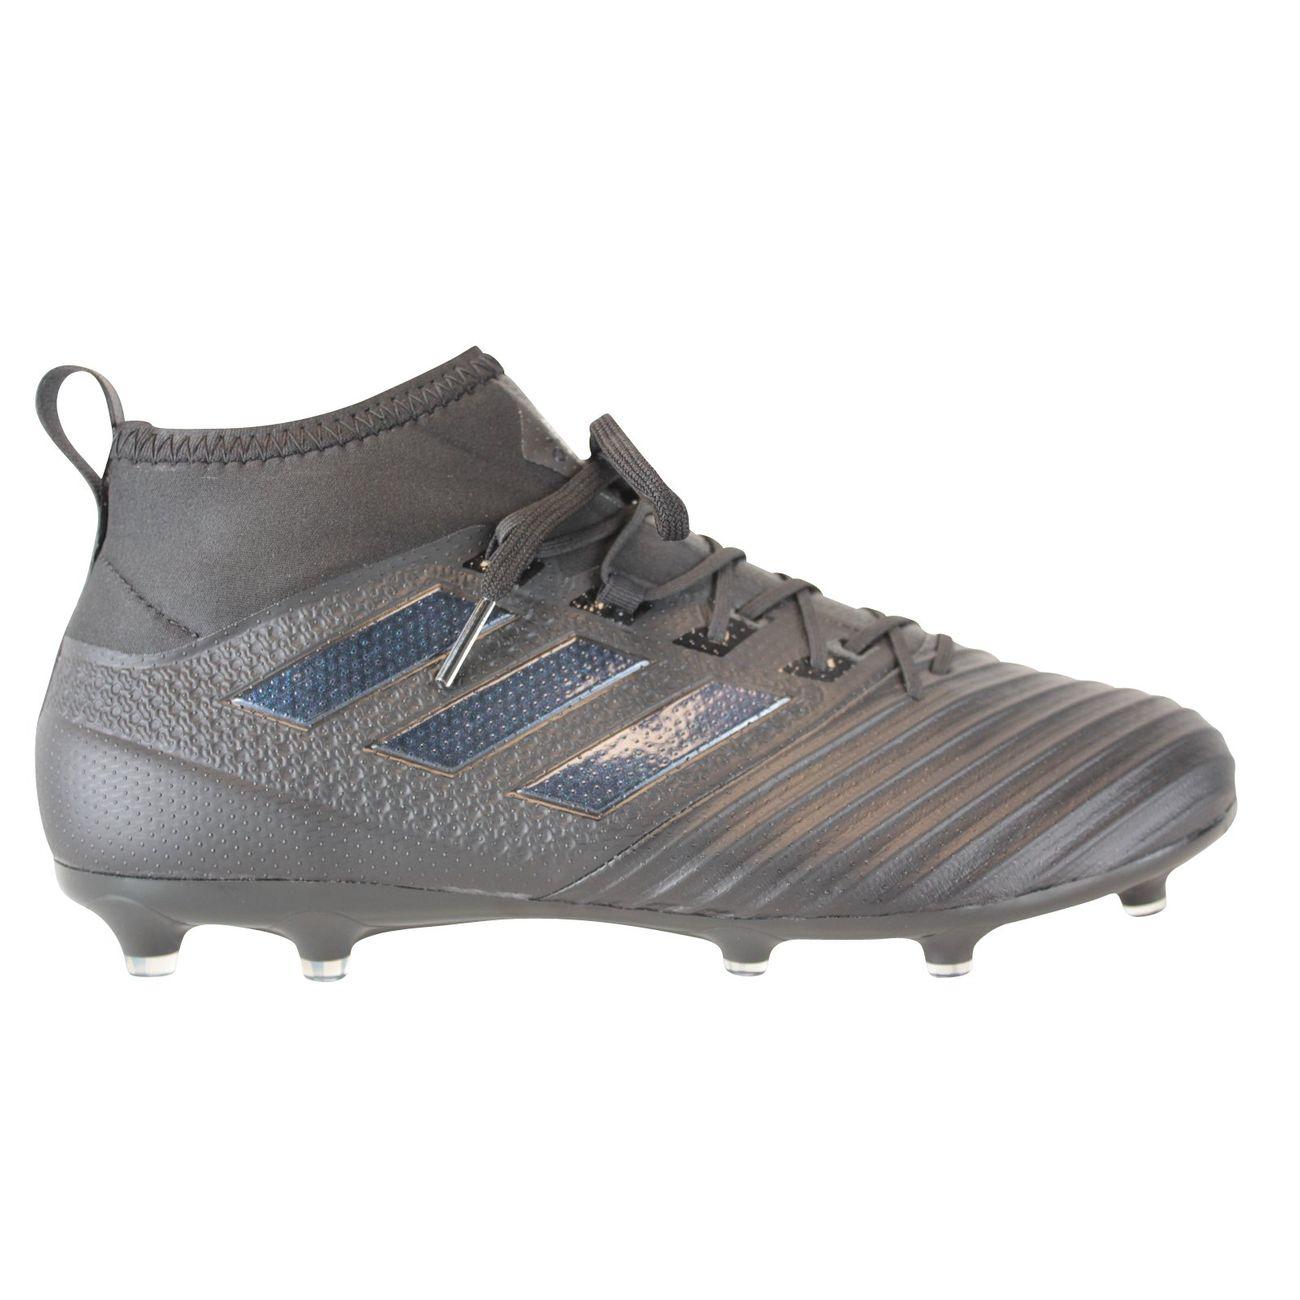 Fg Performance 17 Football Ace Chaussures De Adidas 2 TnSWAvRq